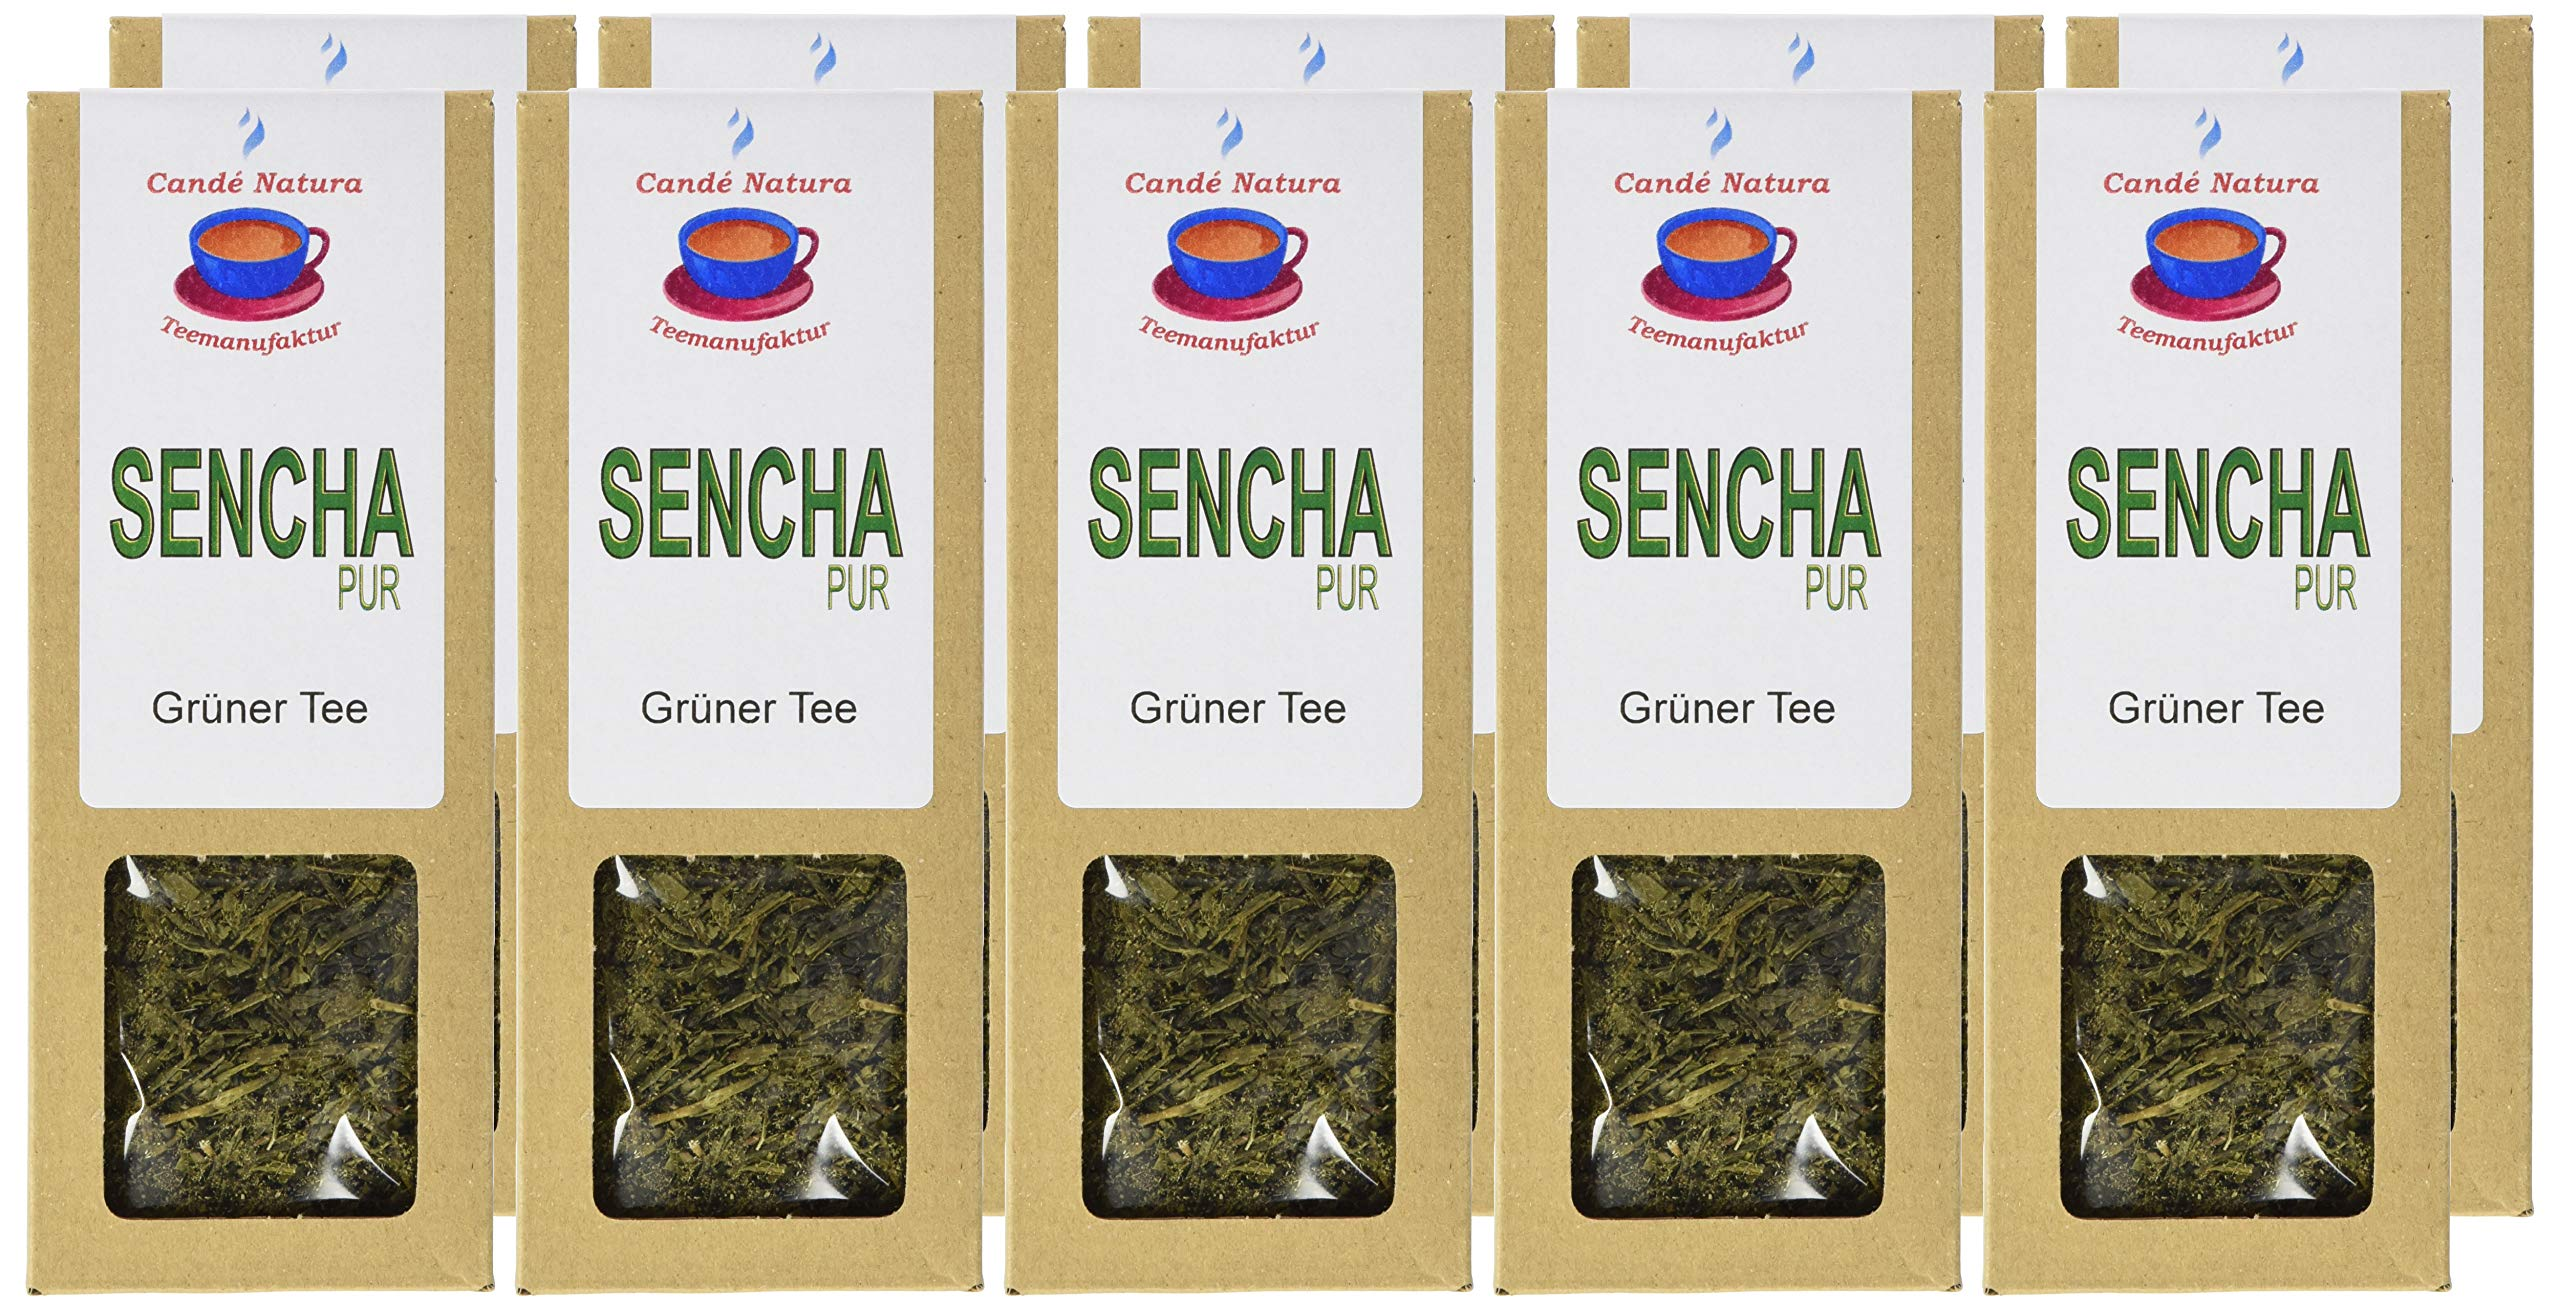 Cand-Natura-Teemanufaktur-China-Sencha-gruener-Tee-Basistee-5er-Pack-5-x-75-g